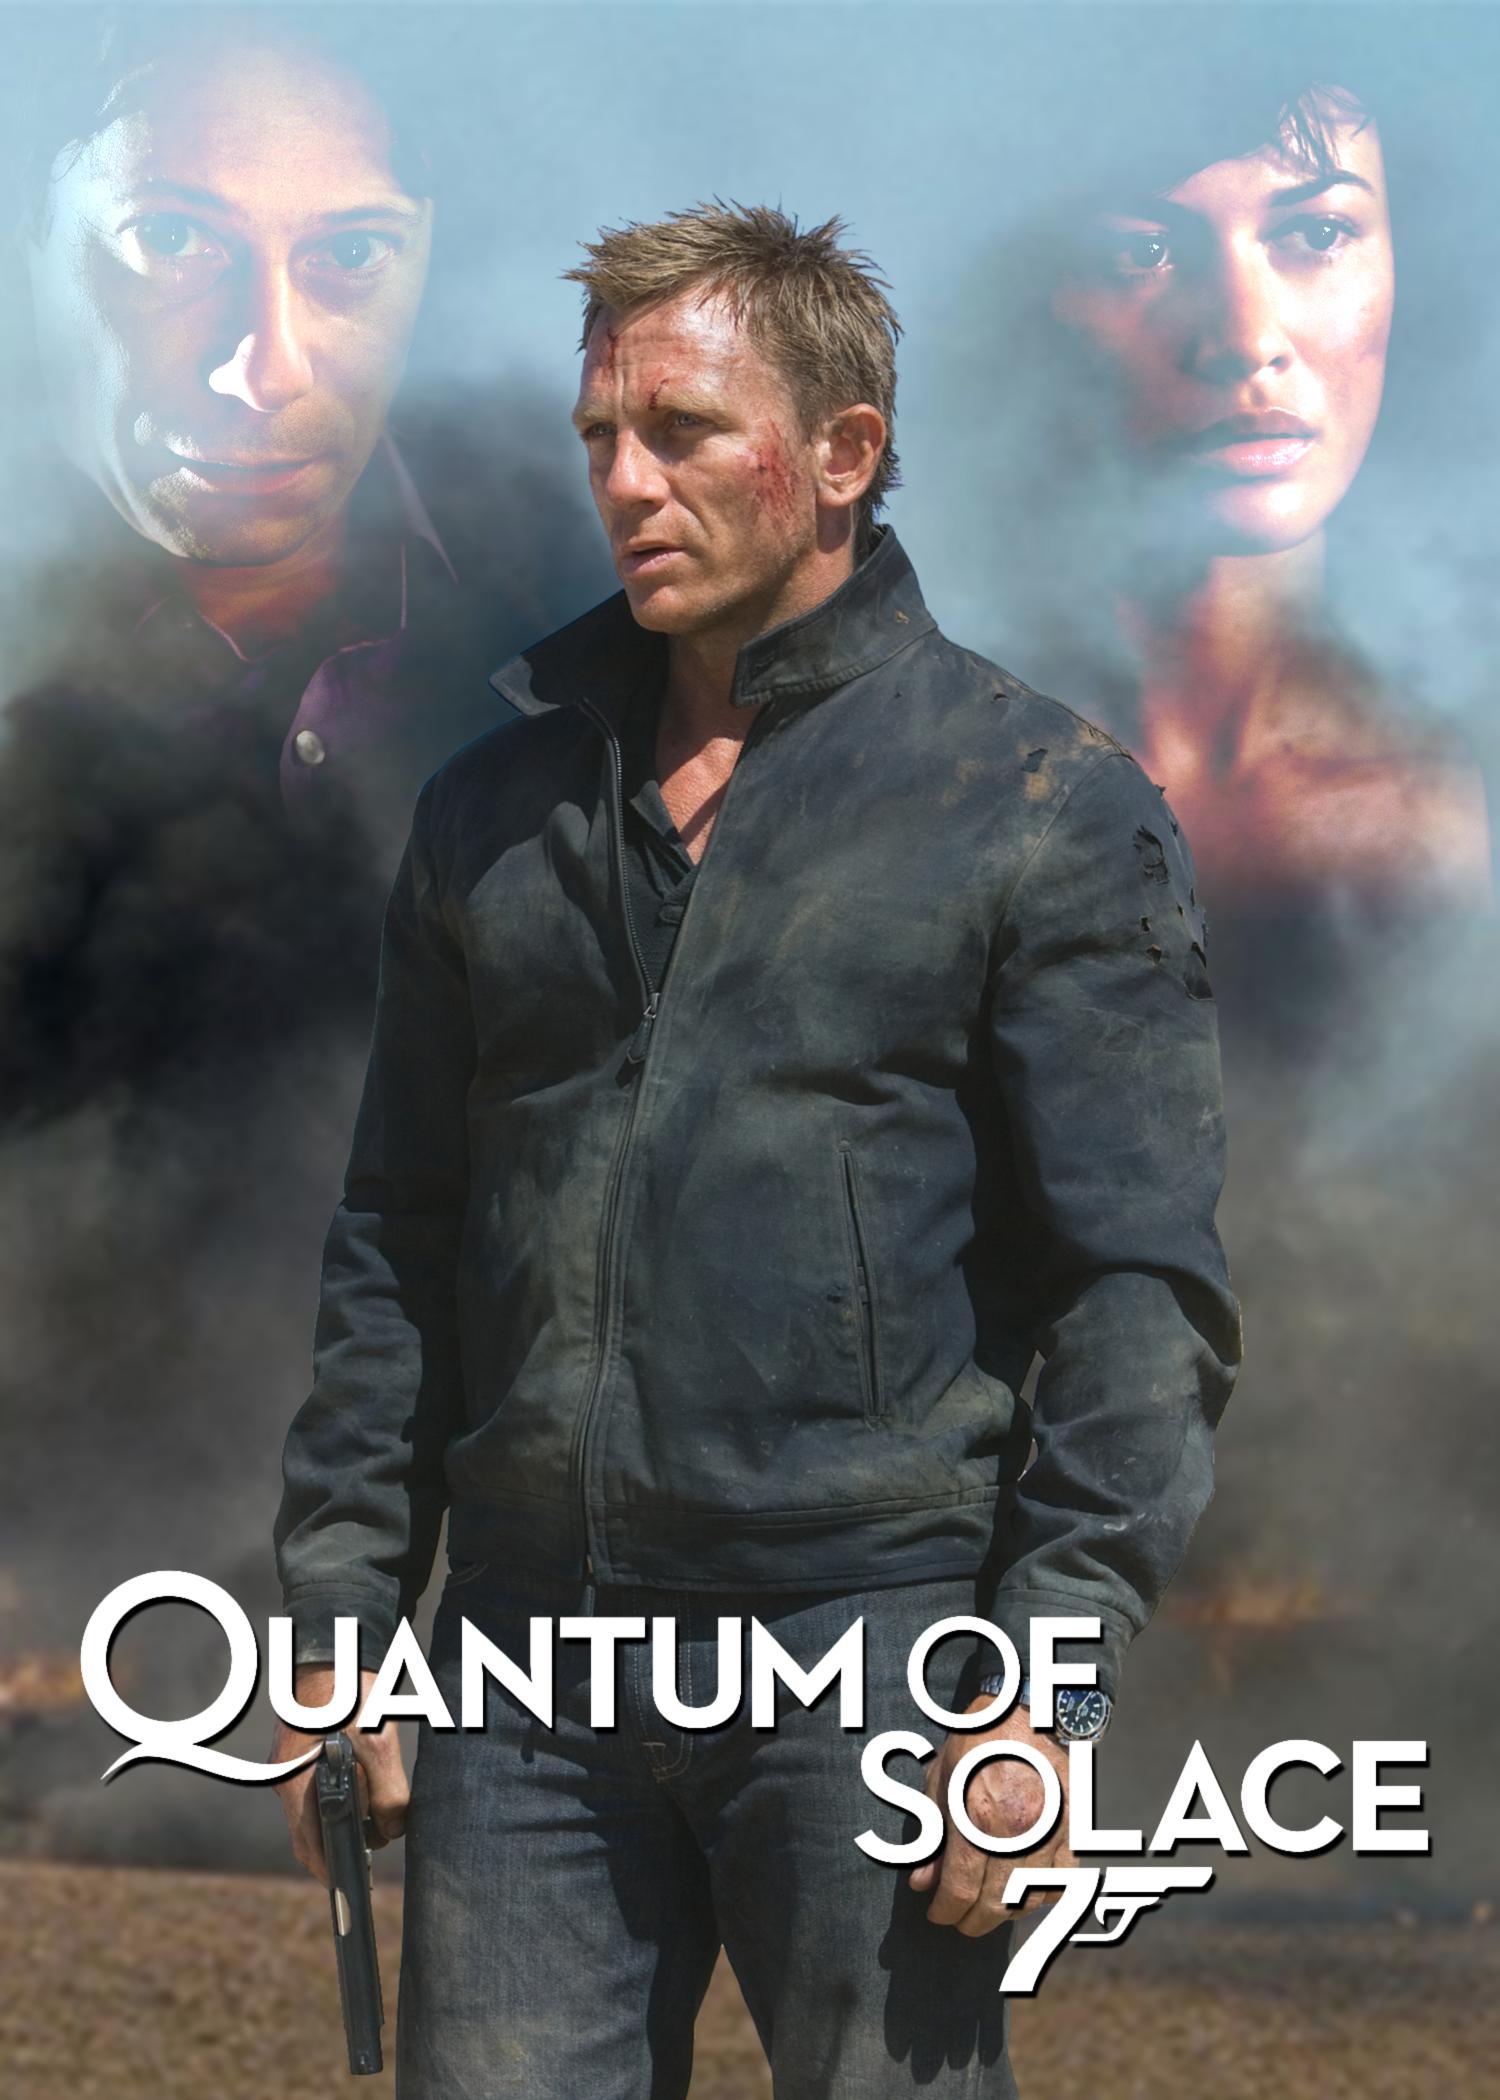 quantum_of_solace_poster__by_comandercool22-d6aicnj.jpg